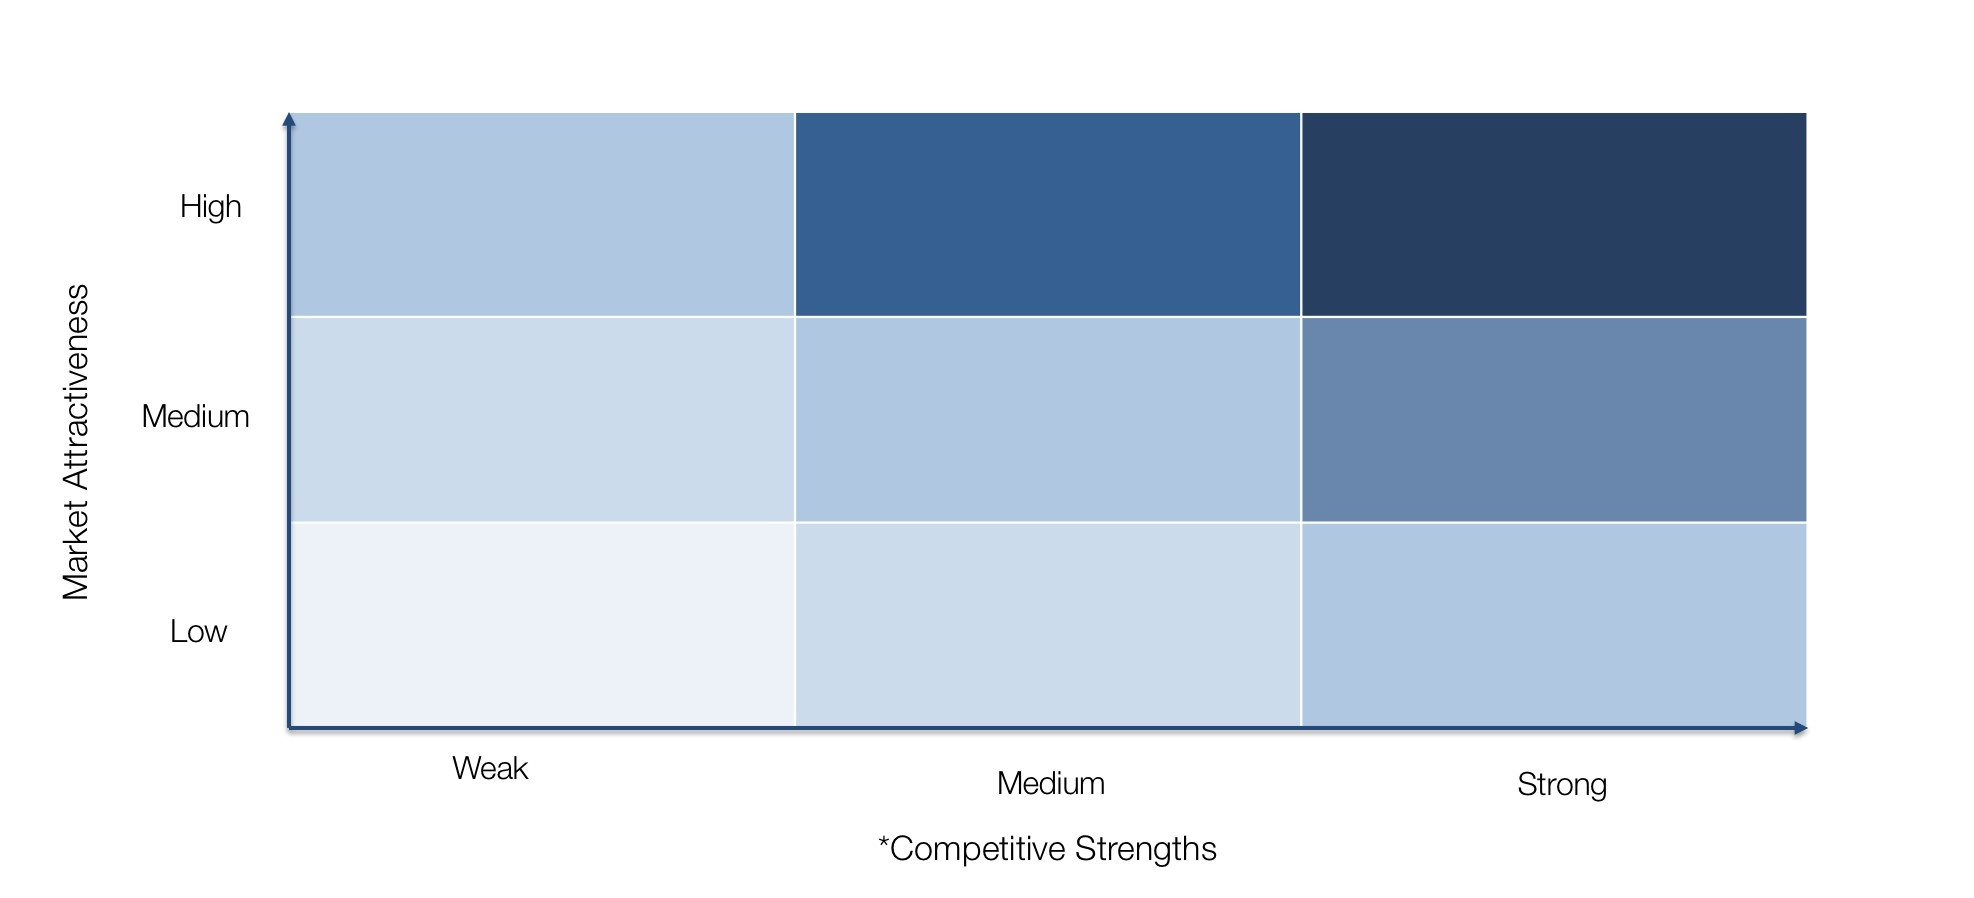 GE McKinsey Matrix.jpg